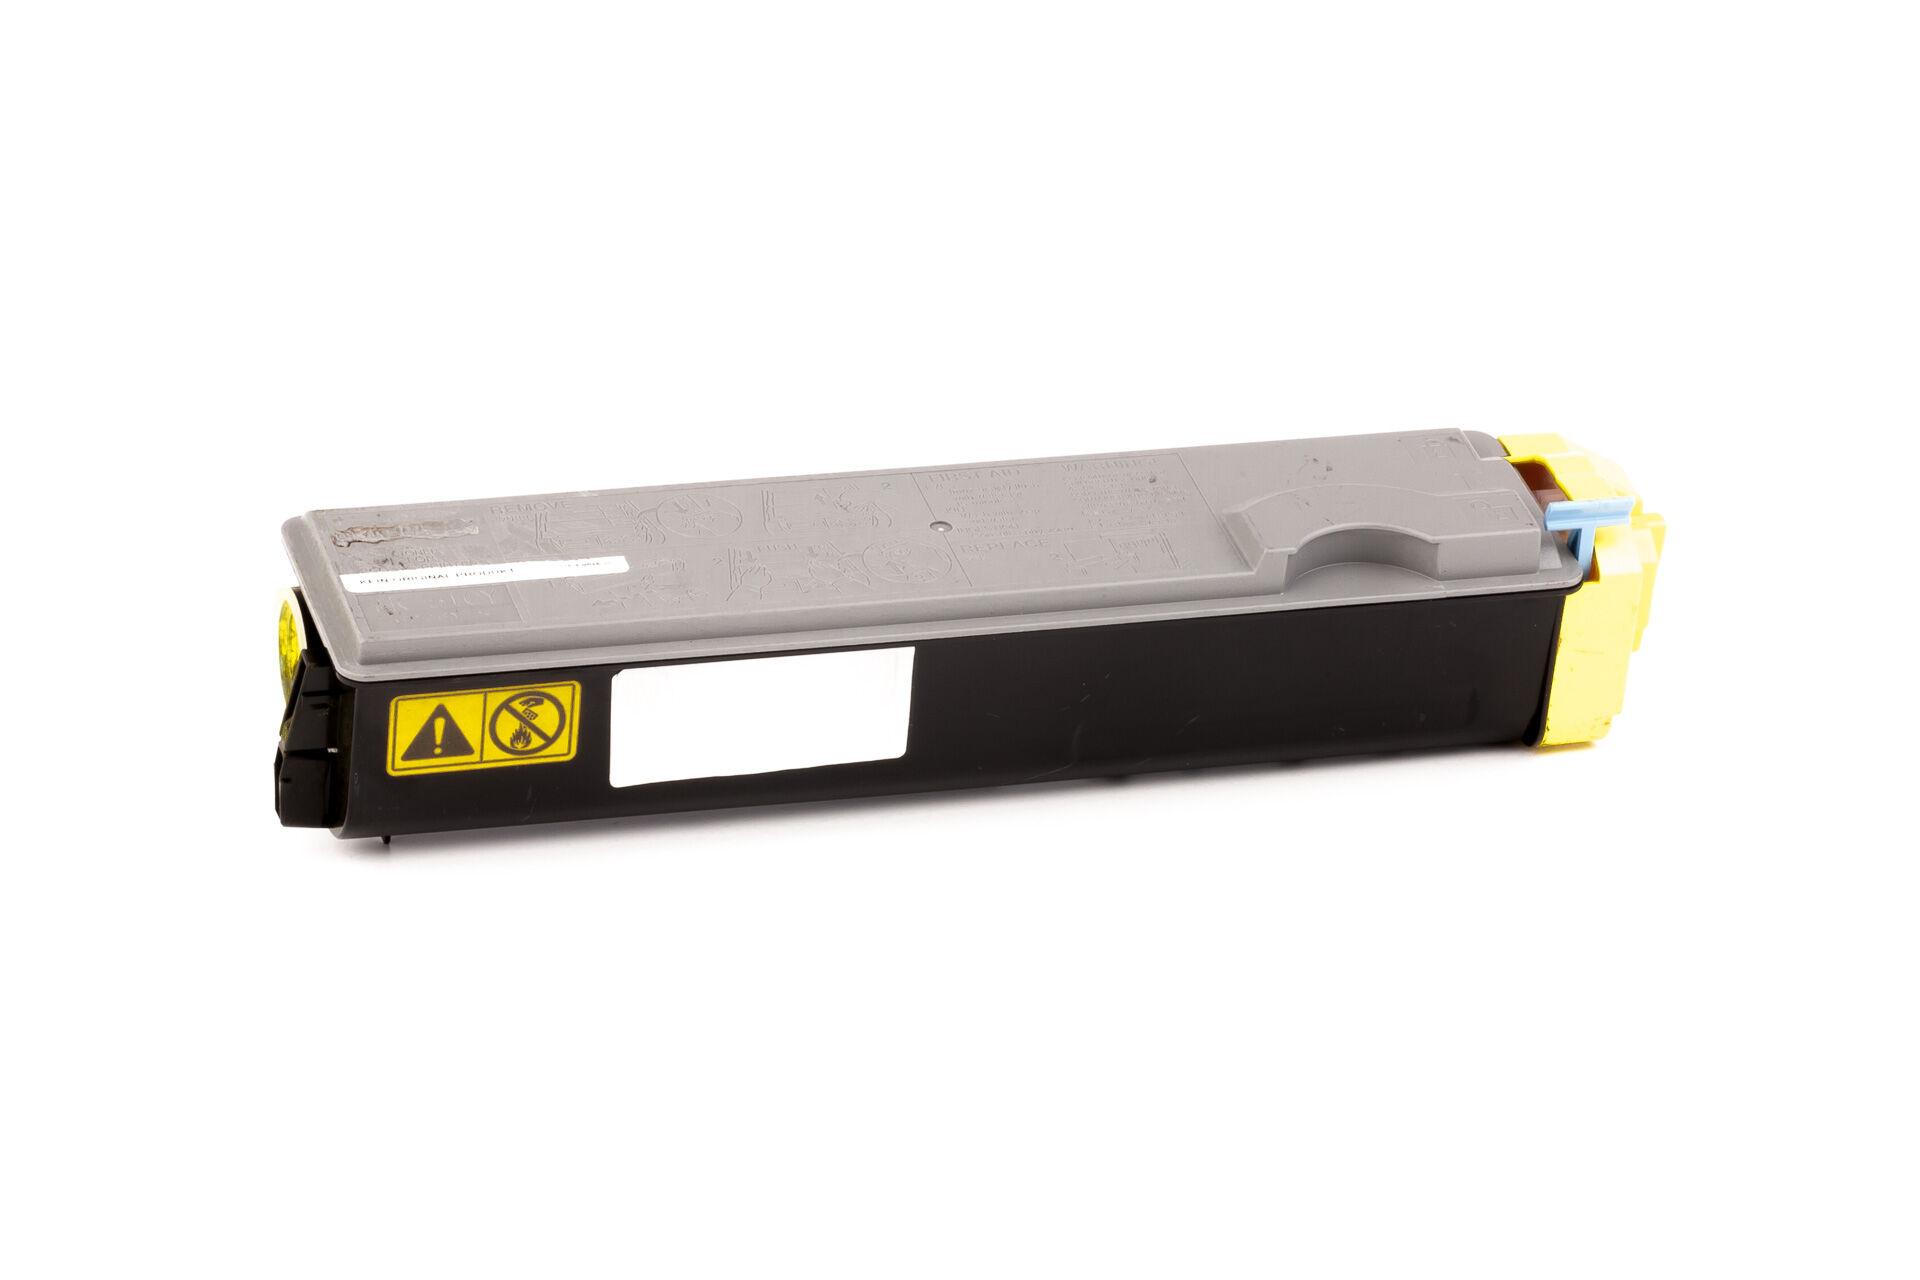 Kyocera Cartouche de Toner pour Kyocera 1T02F3AEU0 / TK-510 Y jaune compatible (de marque ASC)